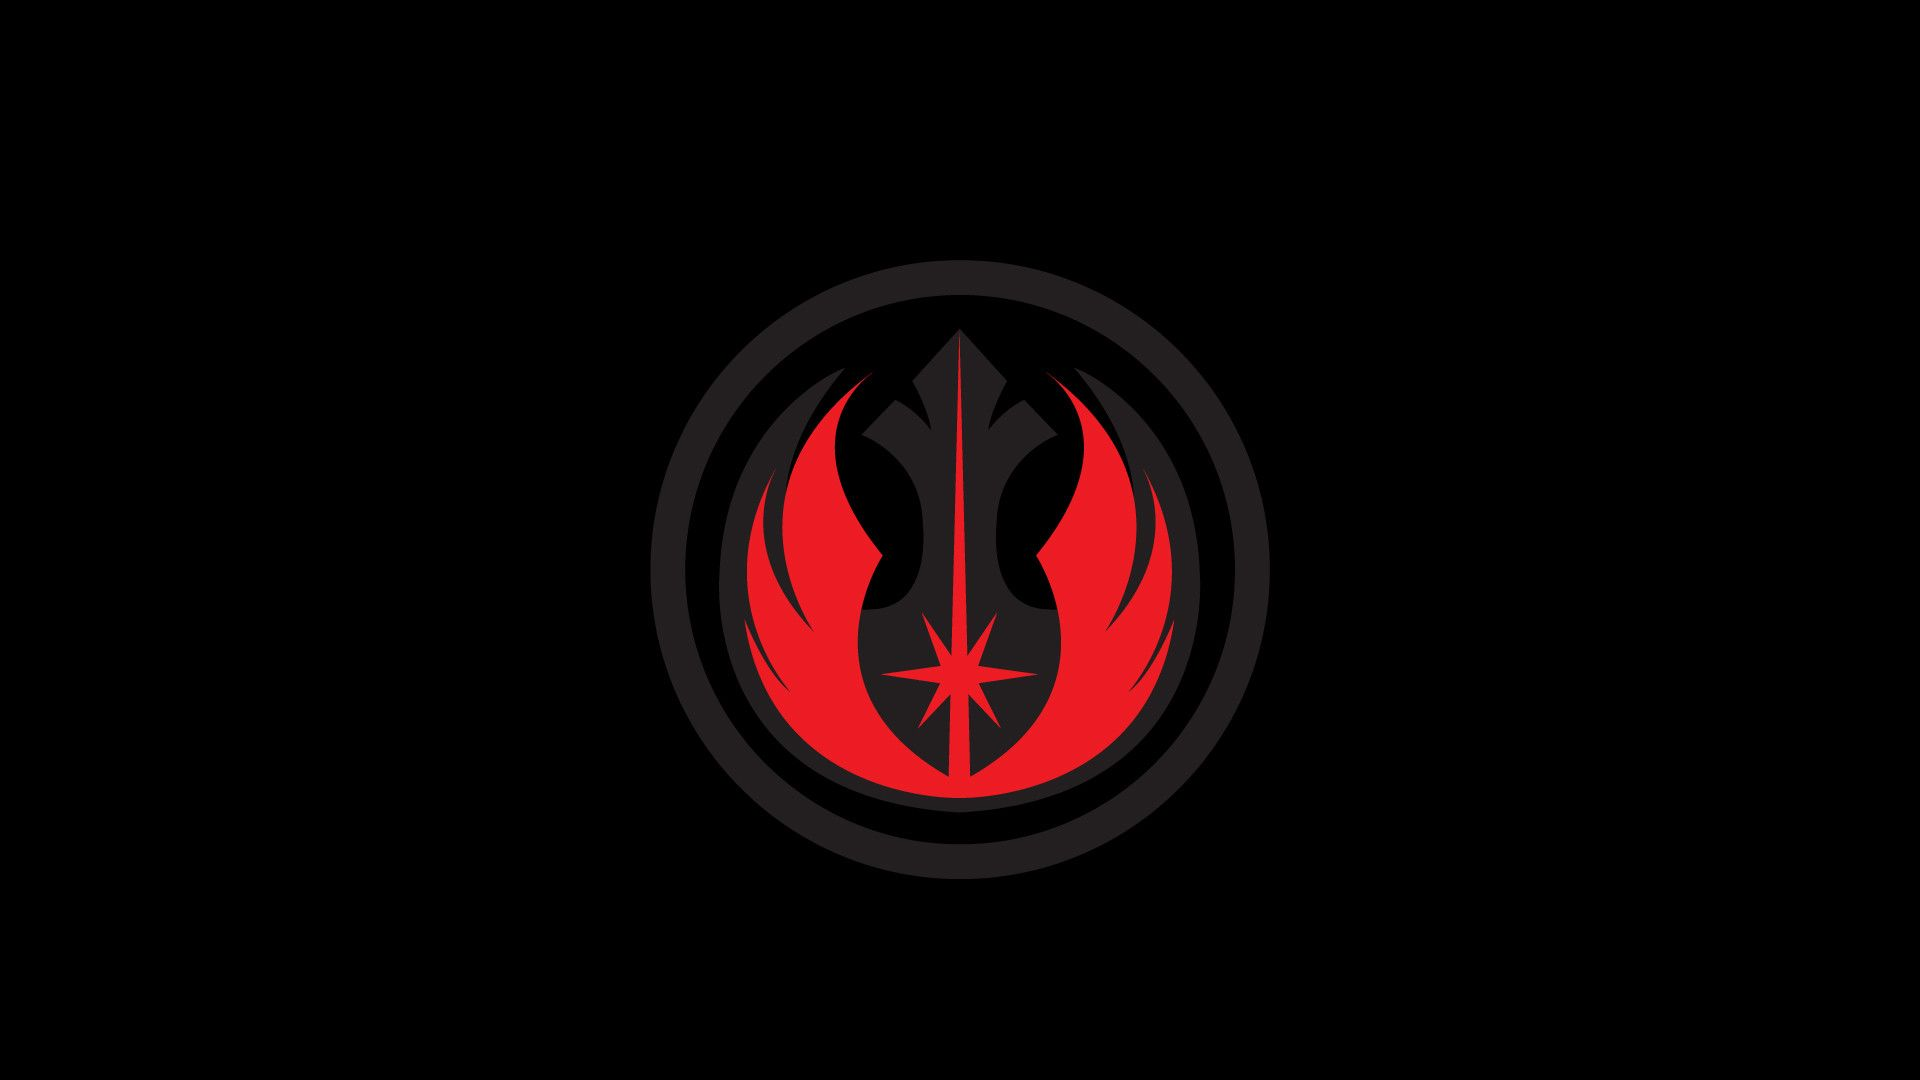 1920x1080 Wallpaper Of My Friends Favourite Star Wars Logos